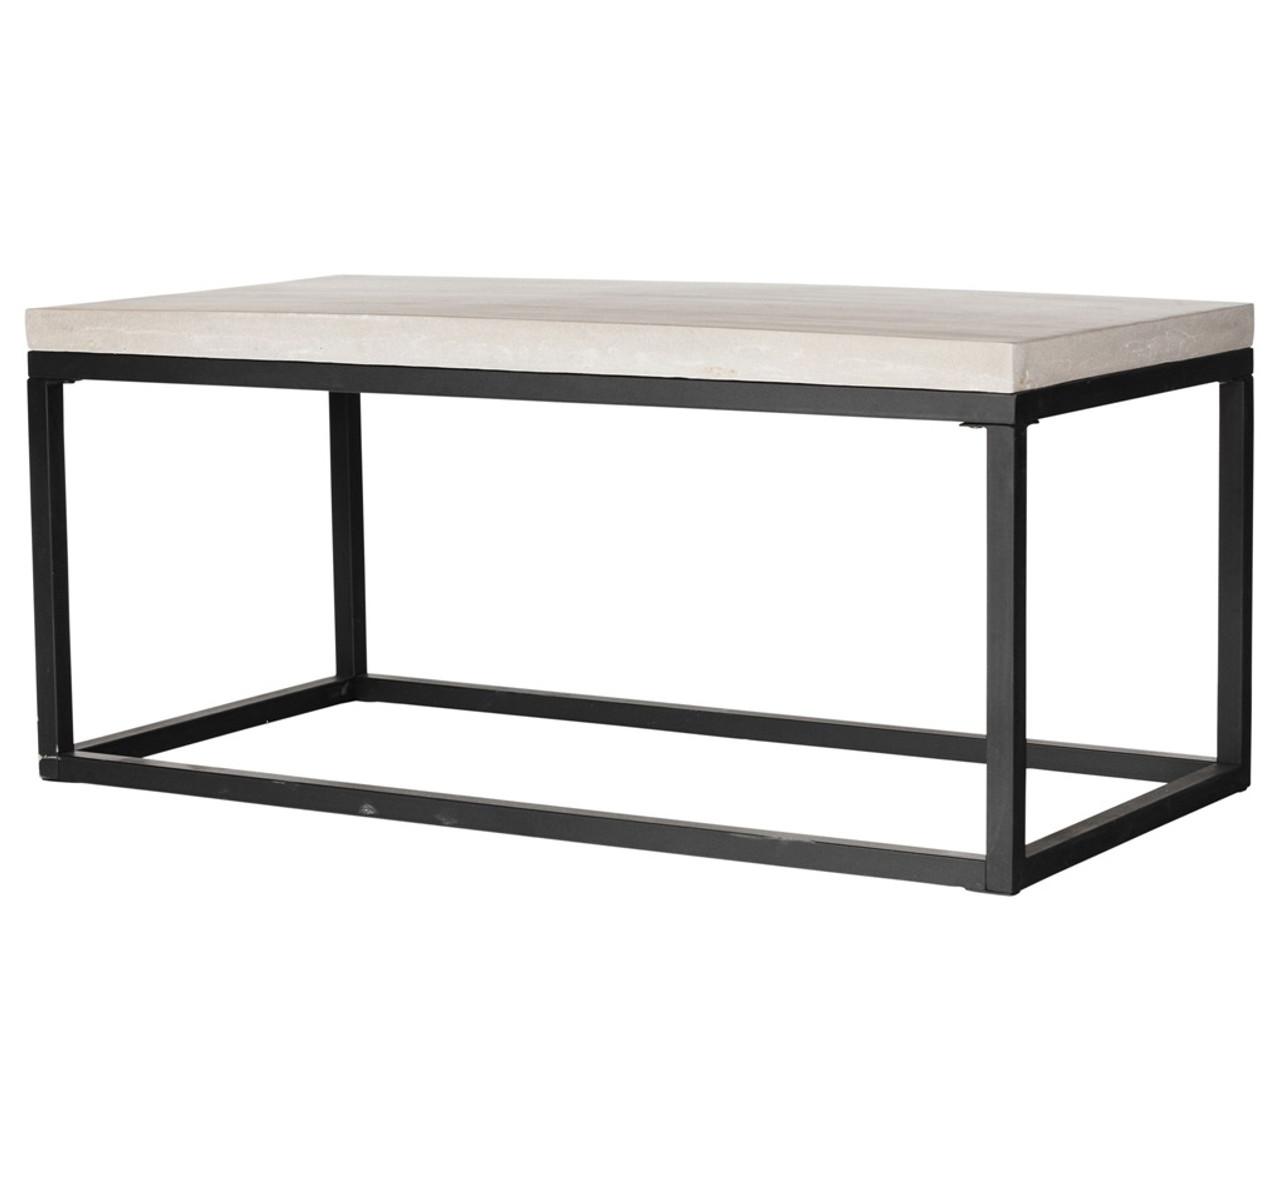 Beau Masonry Concrete Box Frame Rectangular Coffee Table